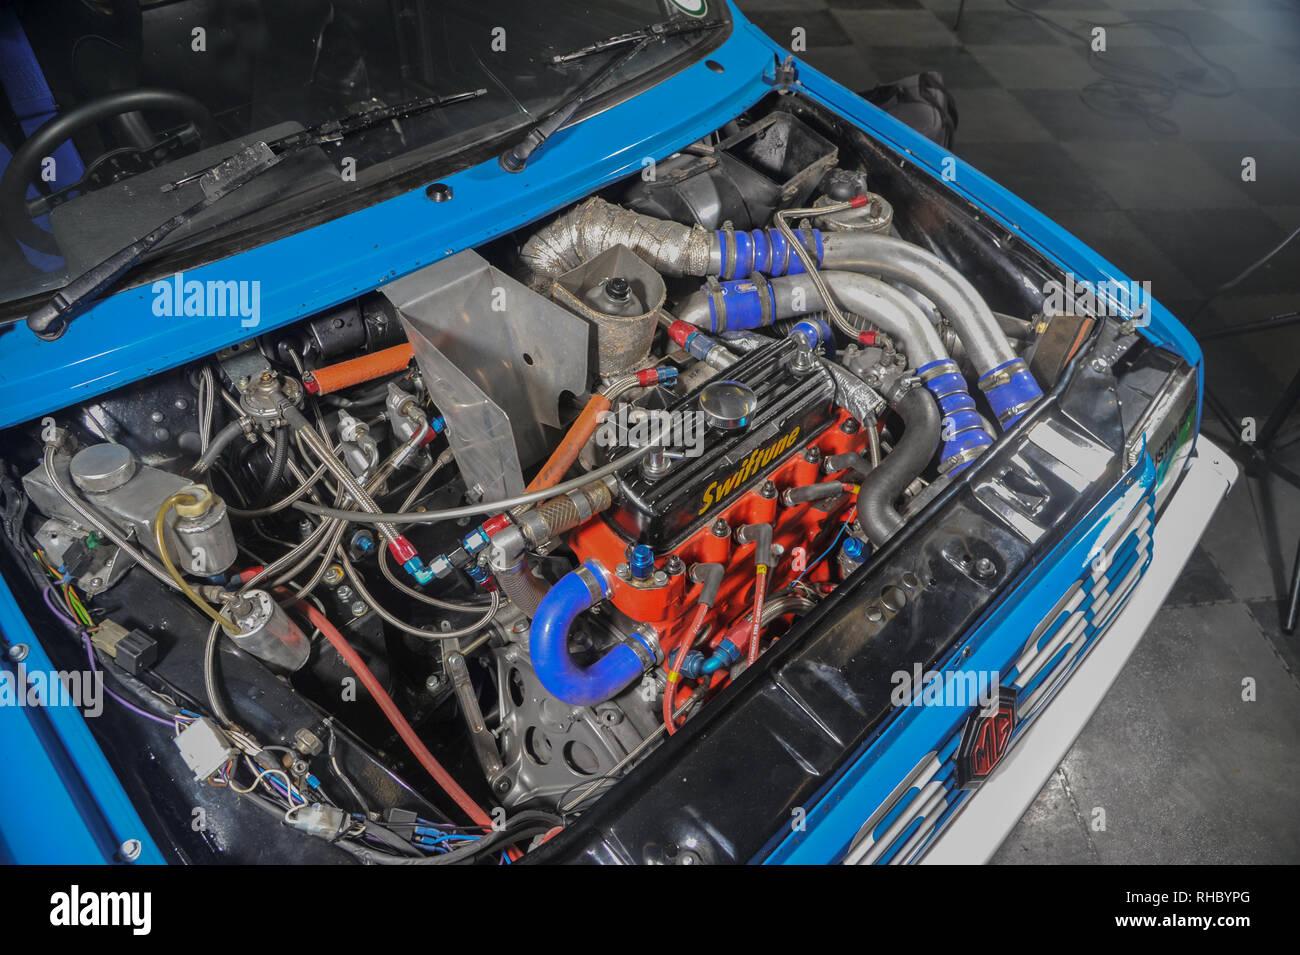 Outstanding Metro 6R4 Rally Car Stock Photo 234447208 Alamy Wiring 101 Relewellnesstrialsorg